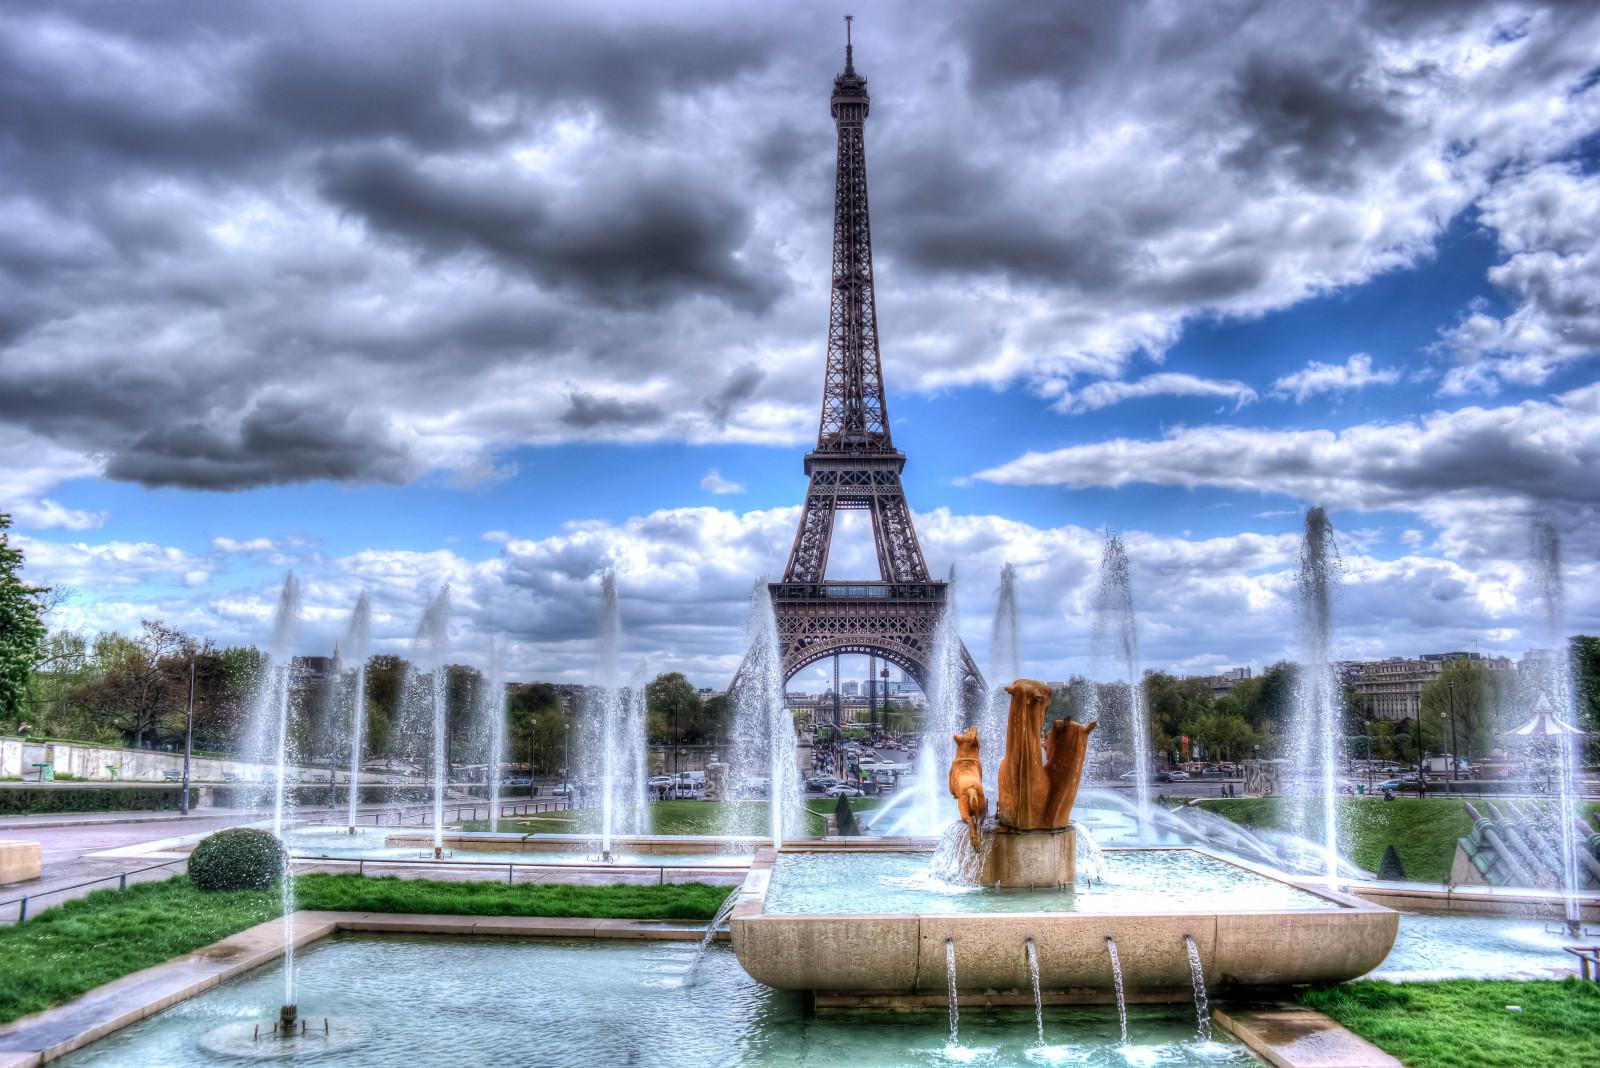 картинка эйфелева башня с фонтанами могут